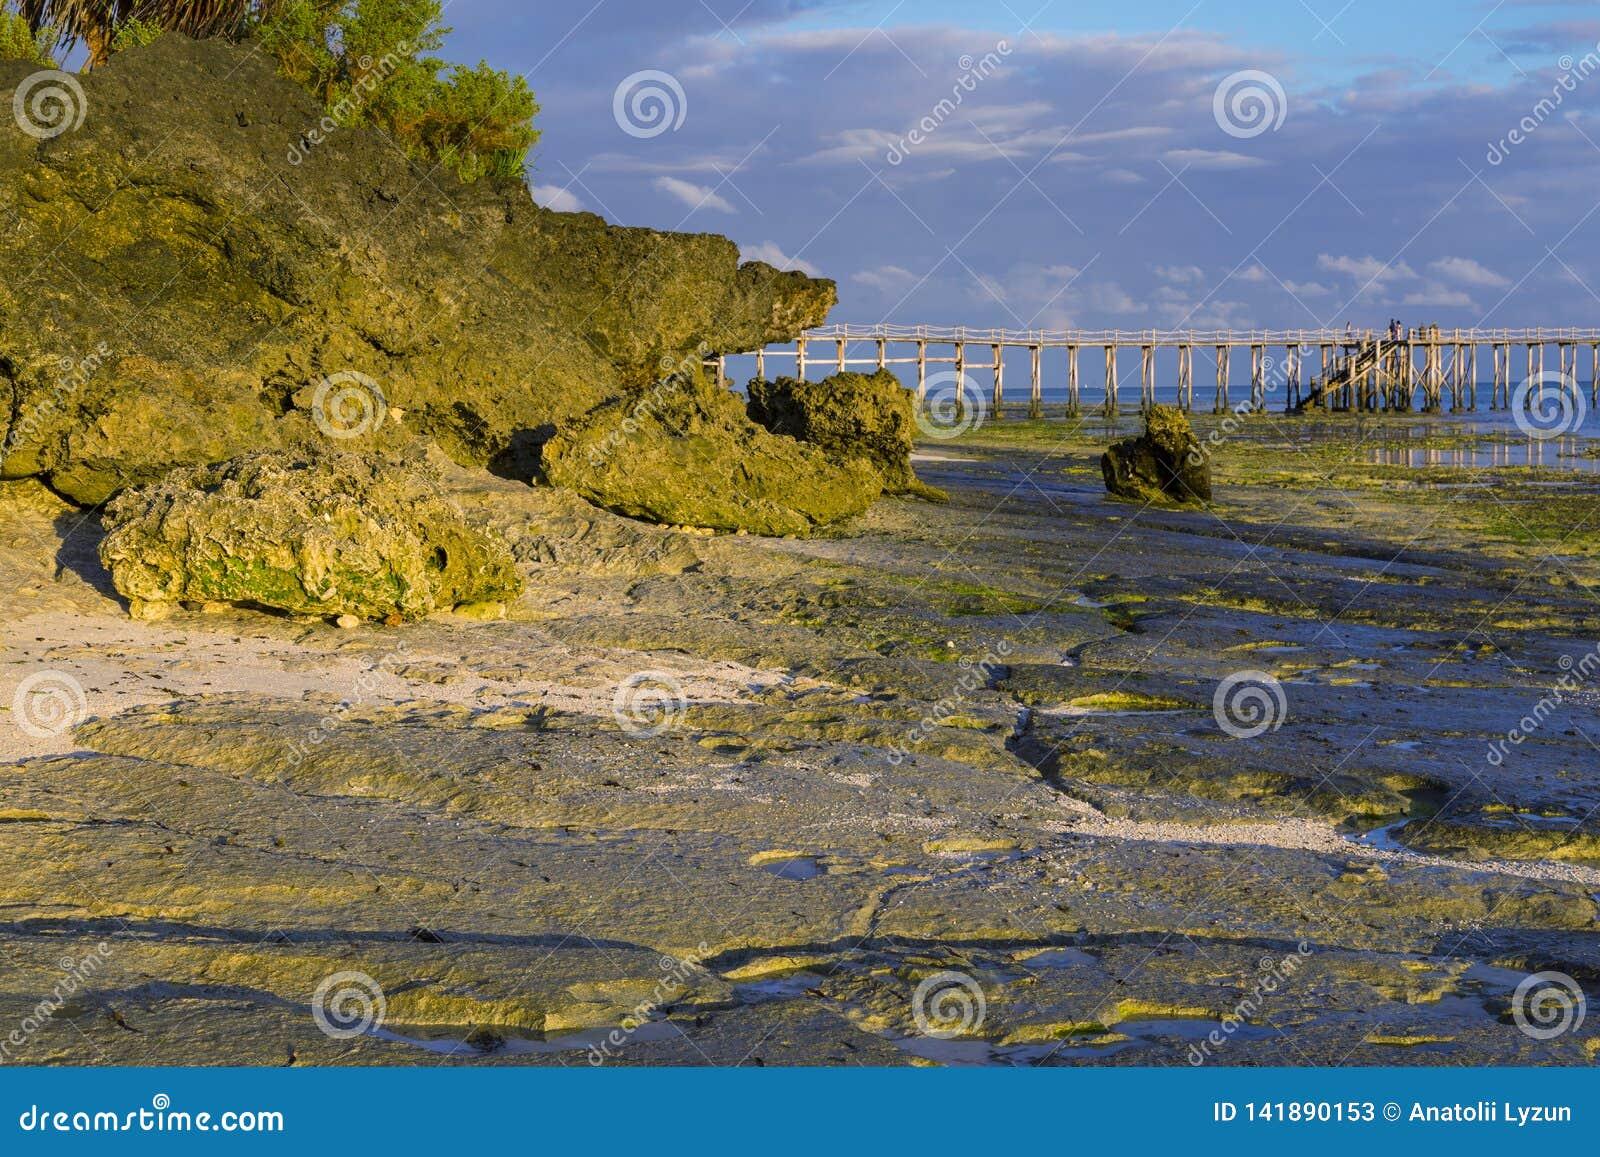 Утро на острове Занзибара побережья океана